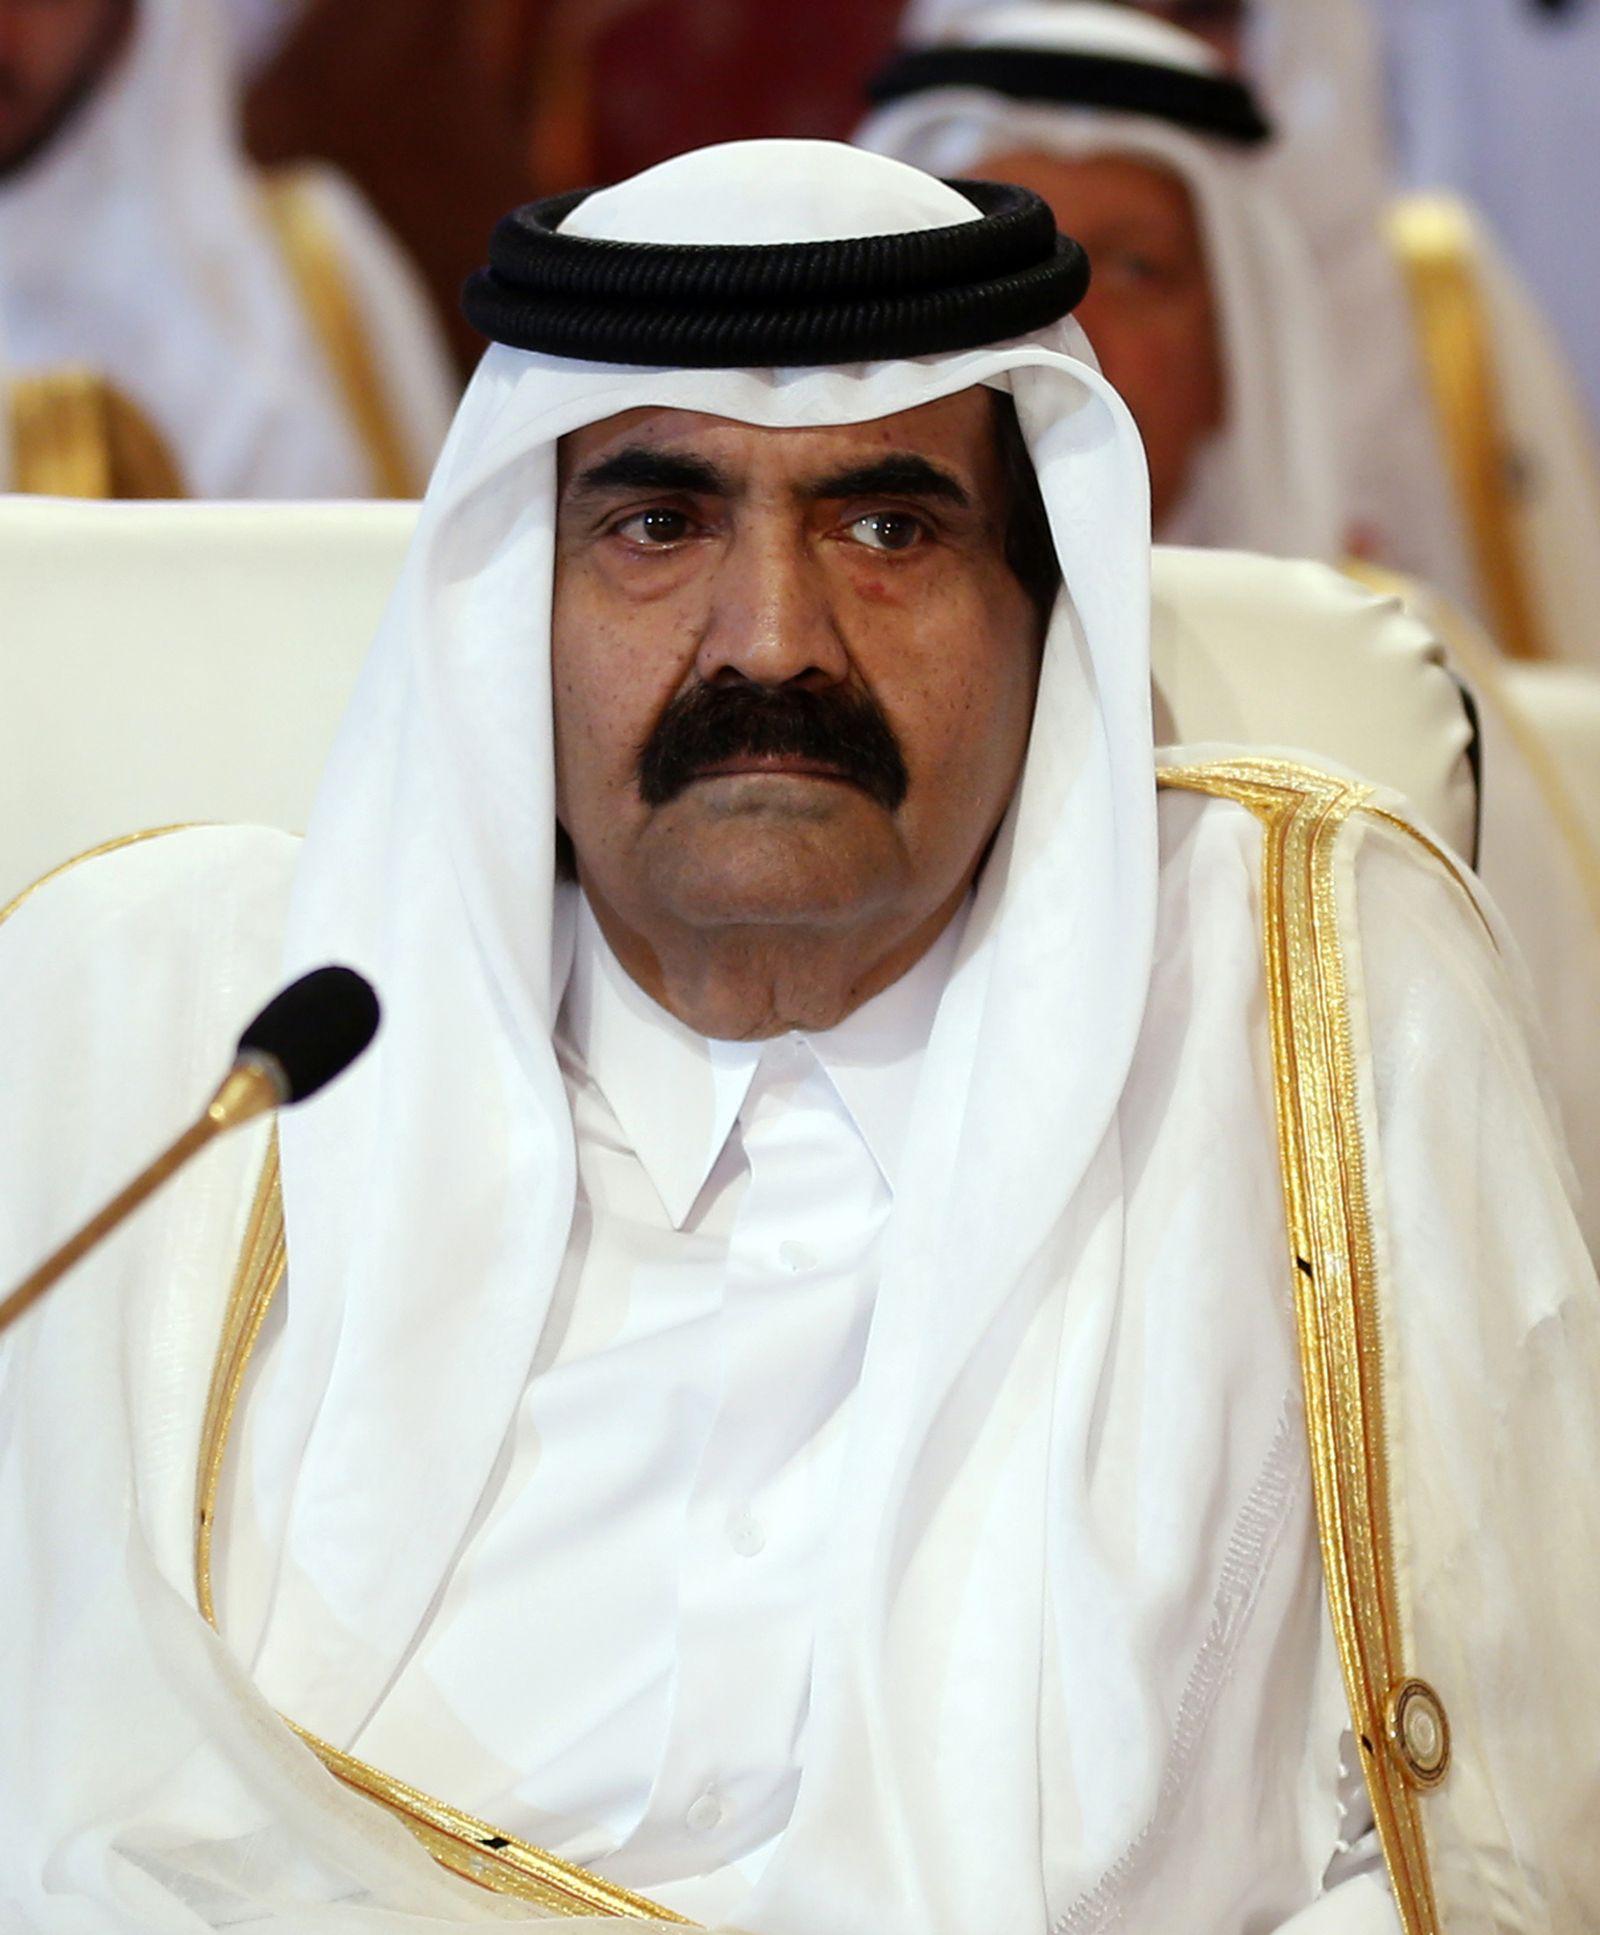 Katar/ Emir Hamad bin Khalifa al-Thani